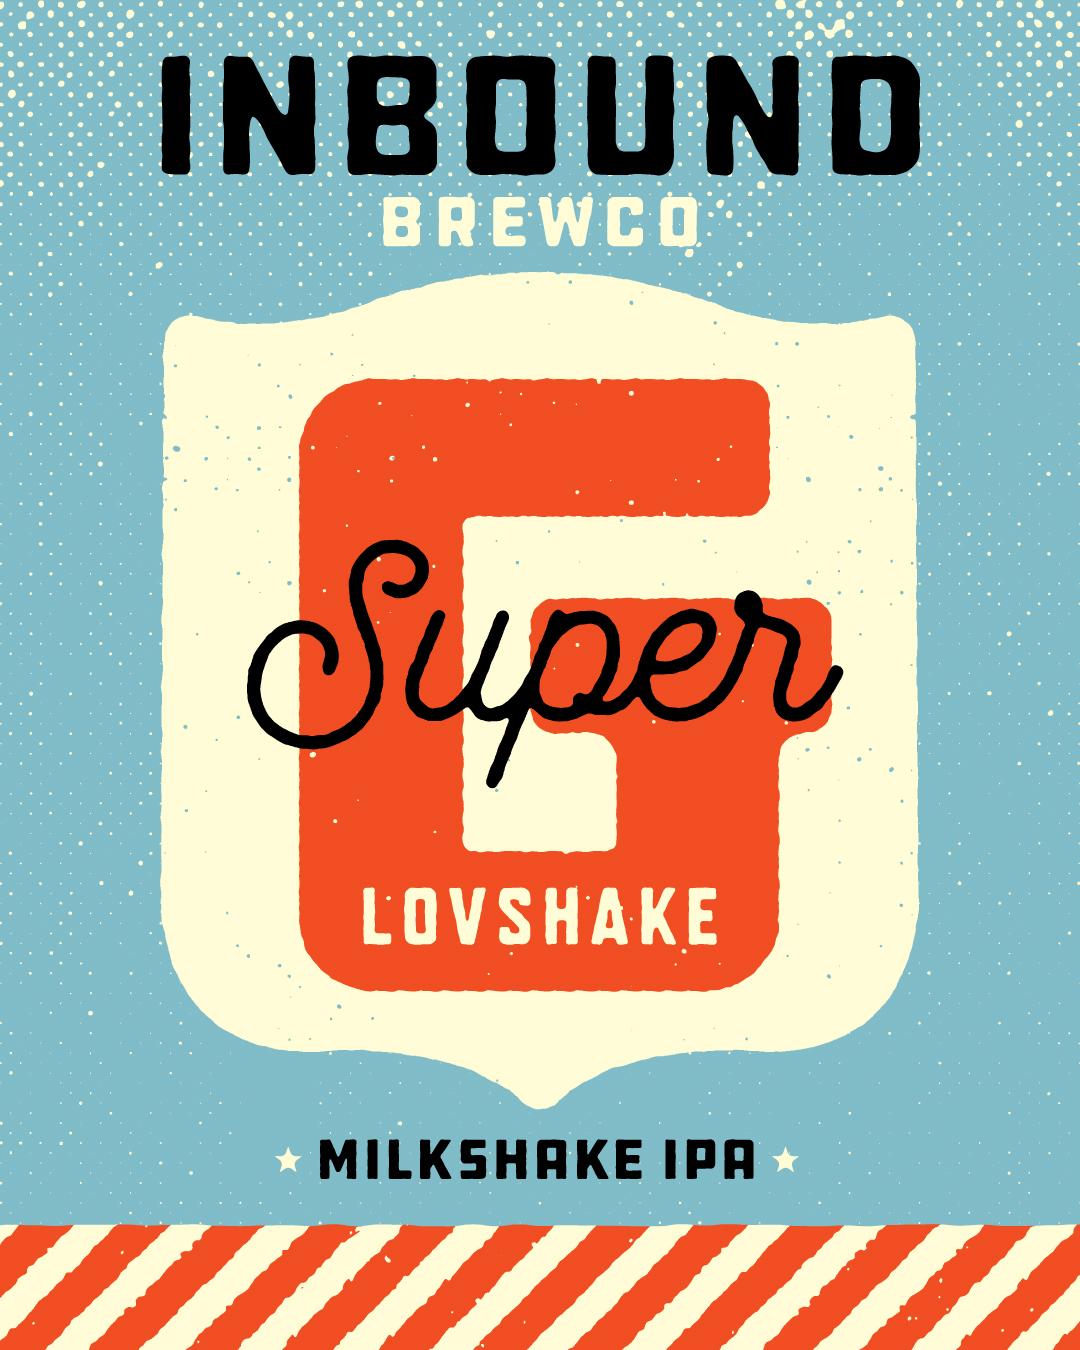 Inbound BrewCo Super G Lovshake Milkshake IPA